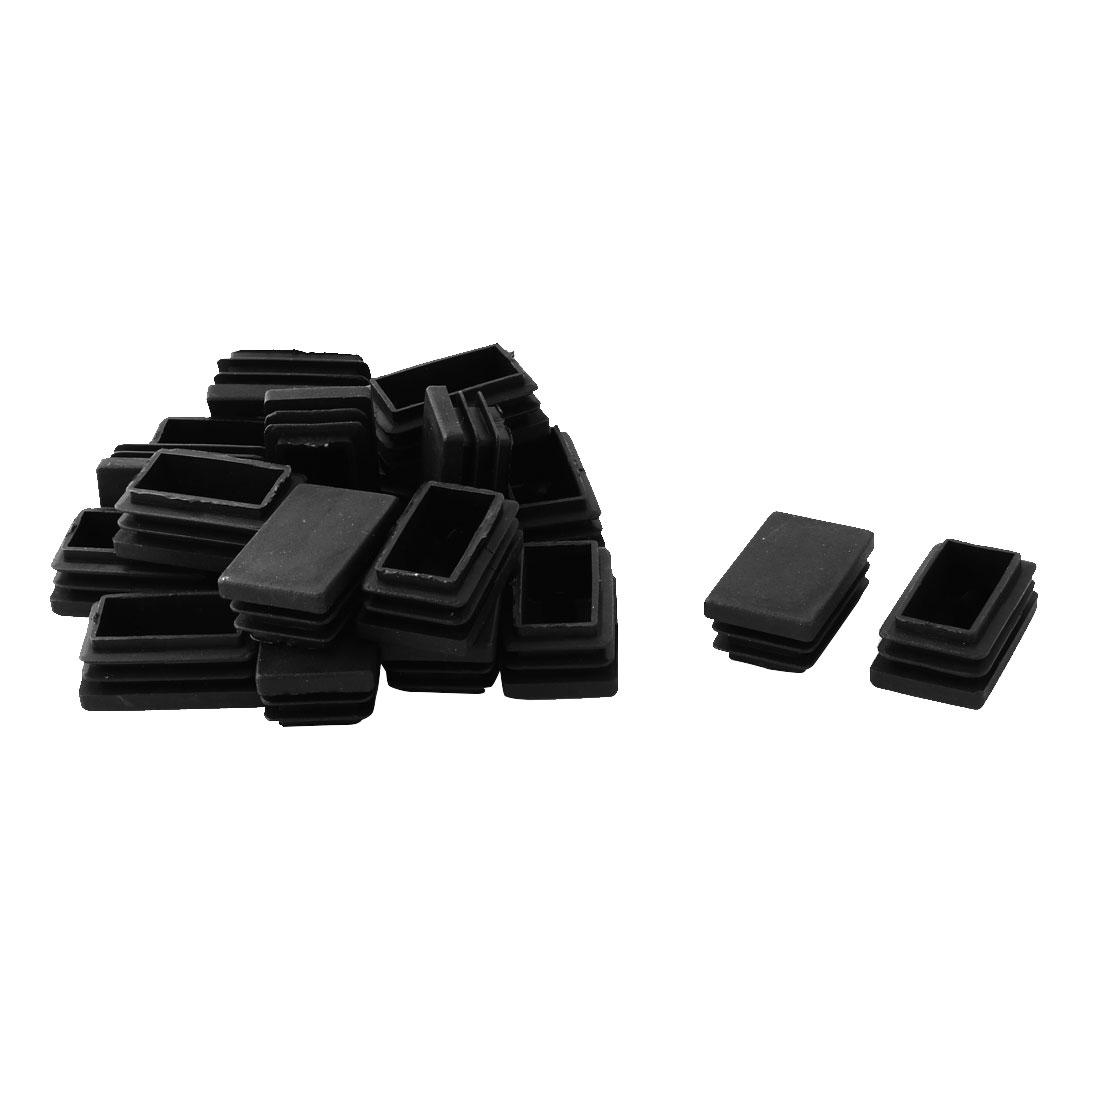 50mm x 30mm Plastic Rectangle Table Chair Leg Feet Tube Pipe Insert End Cap Black 20pcs